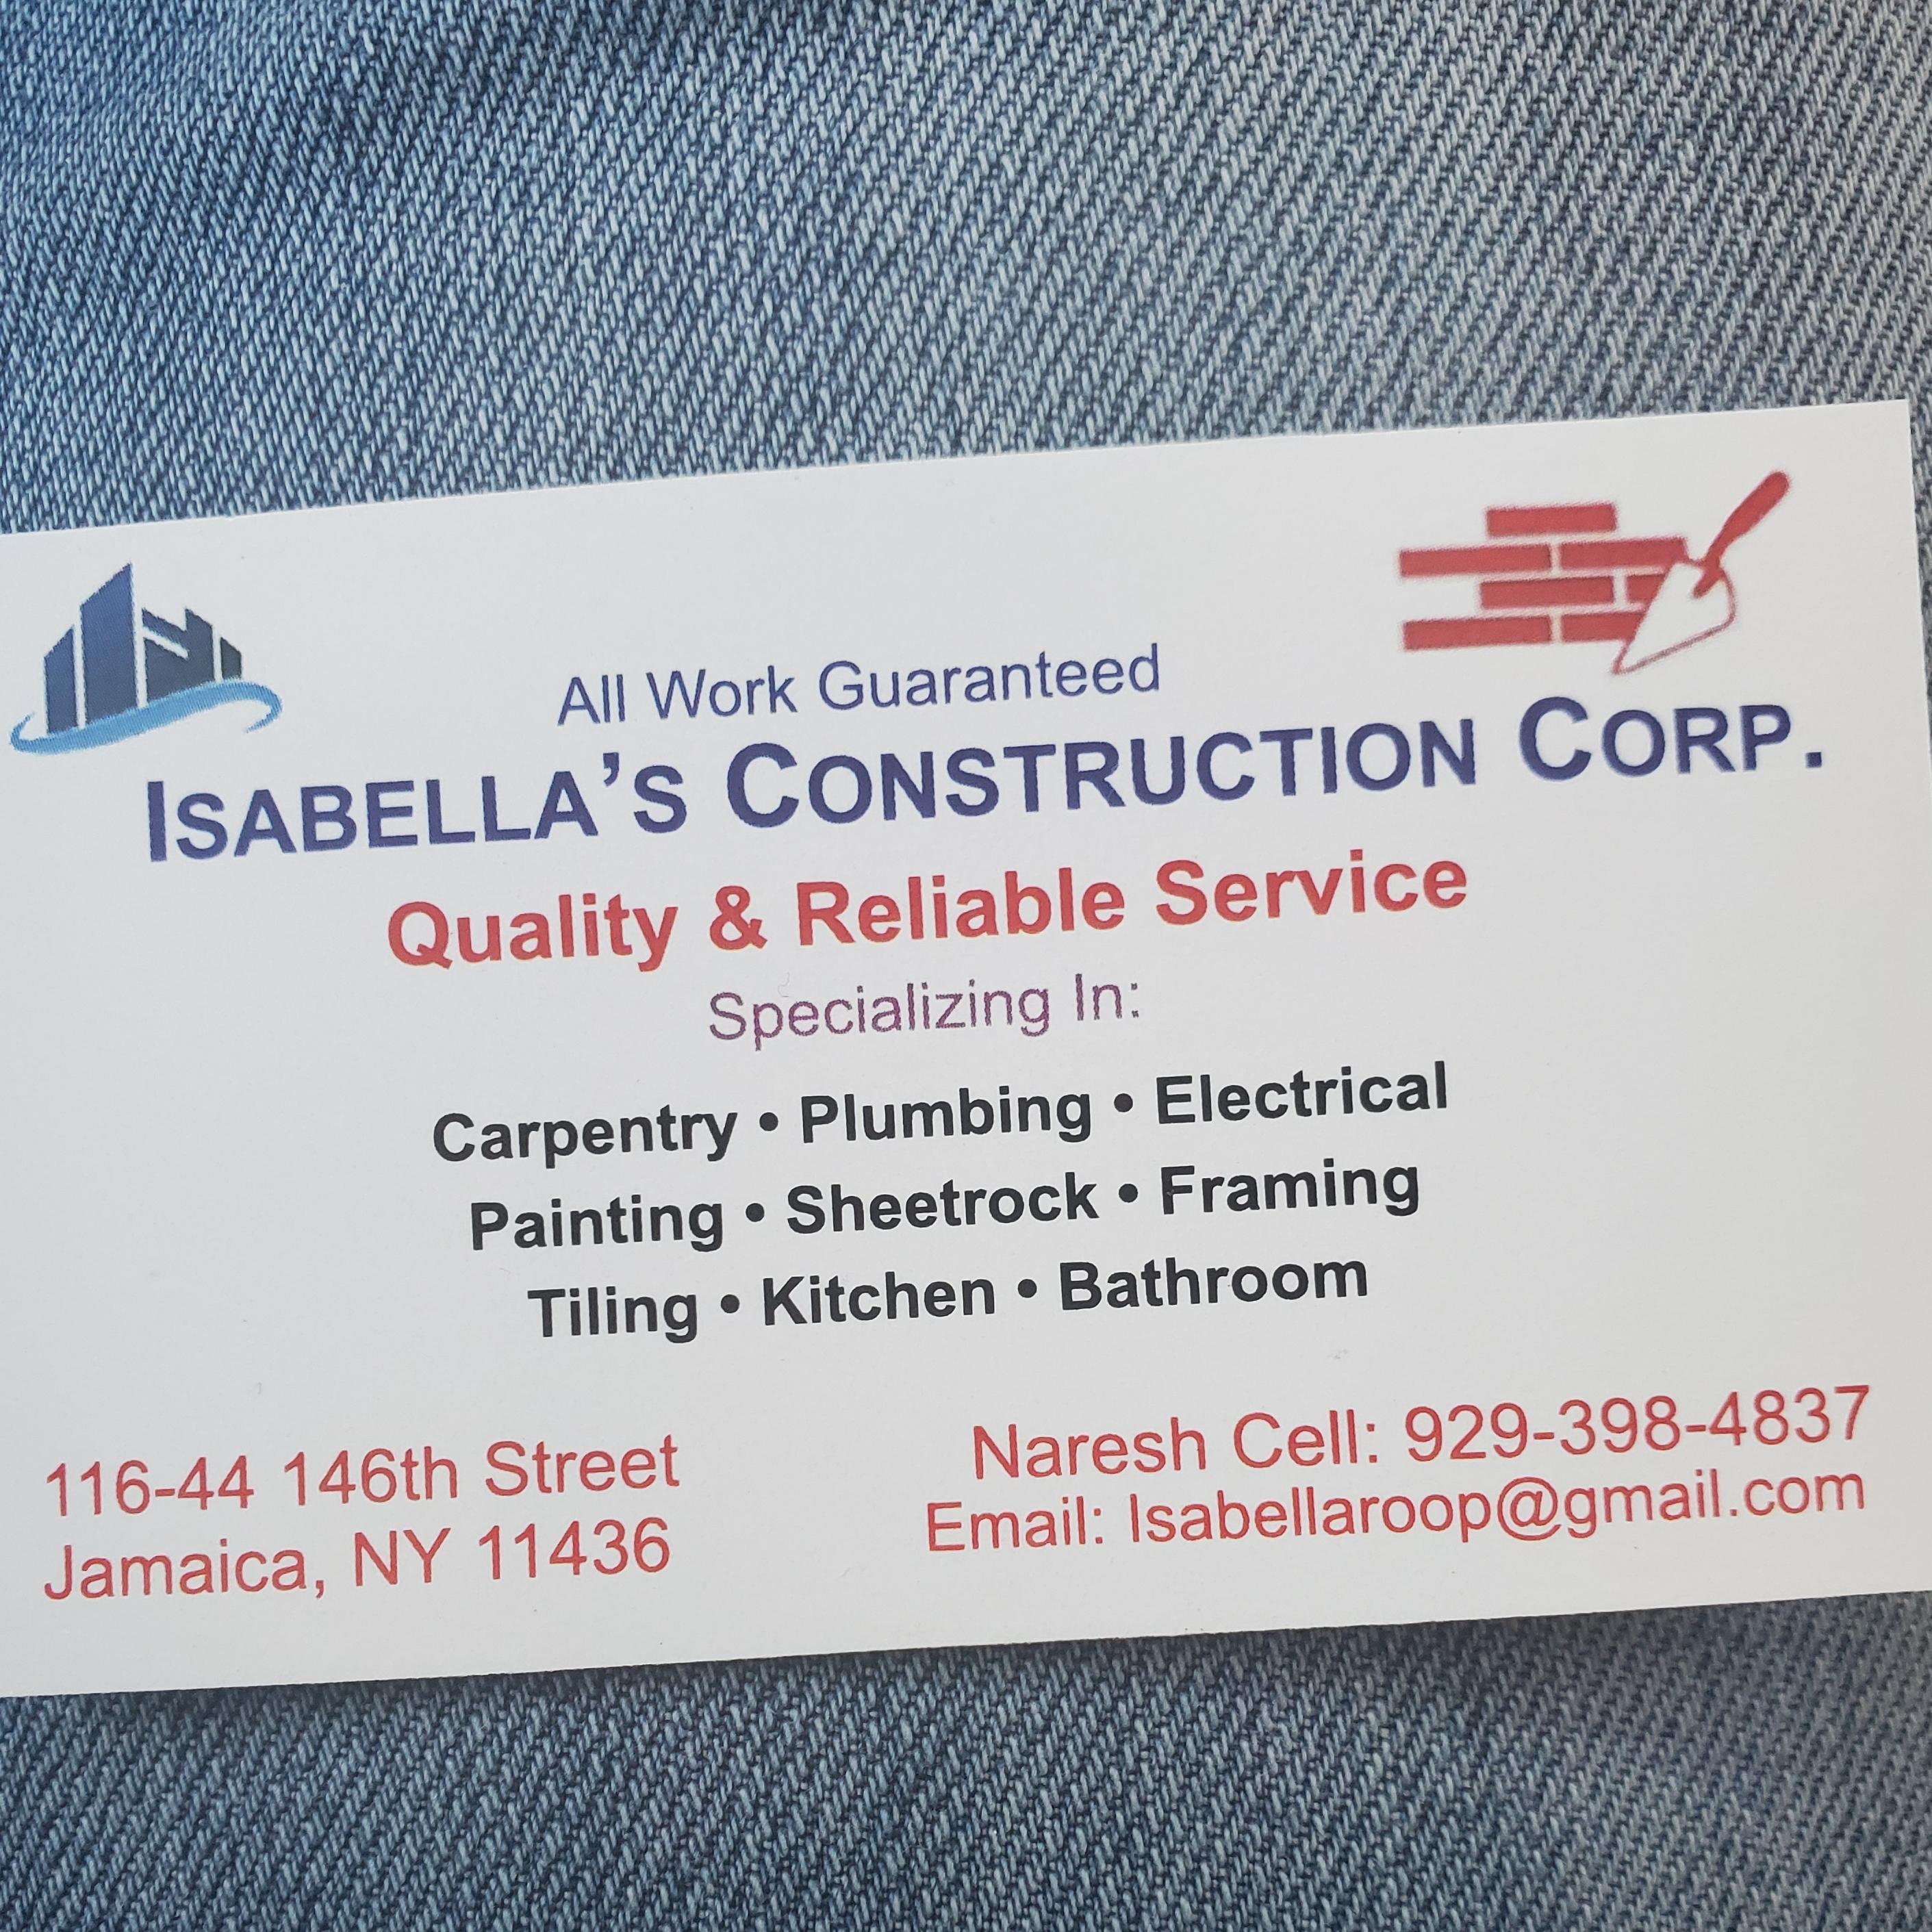 Isabella Corp